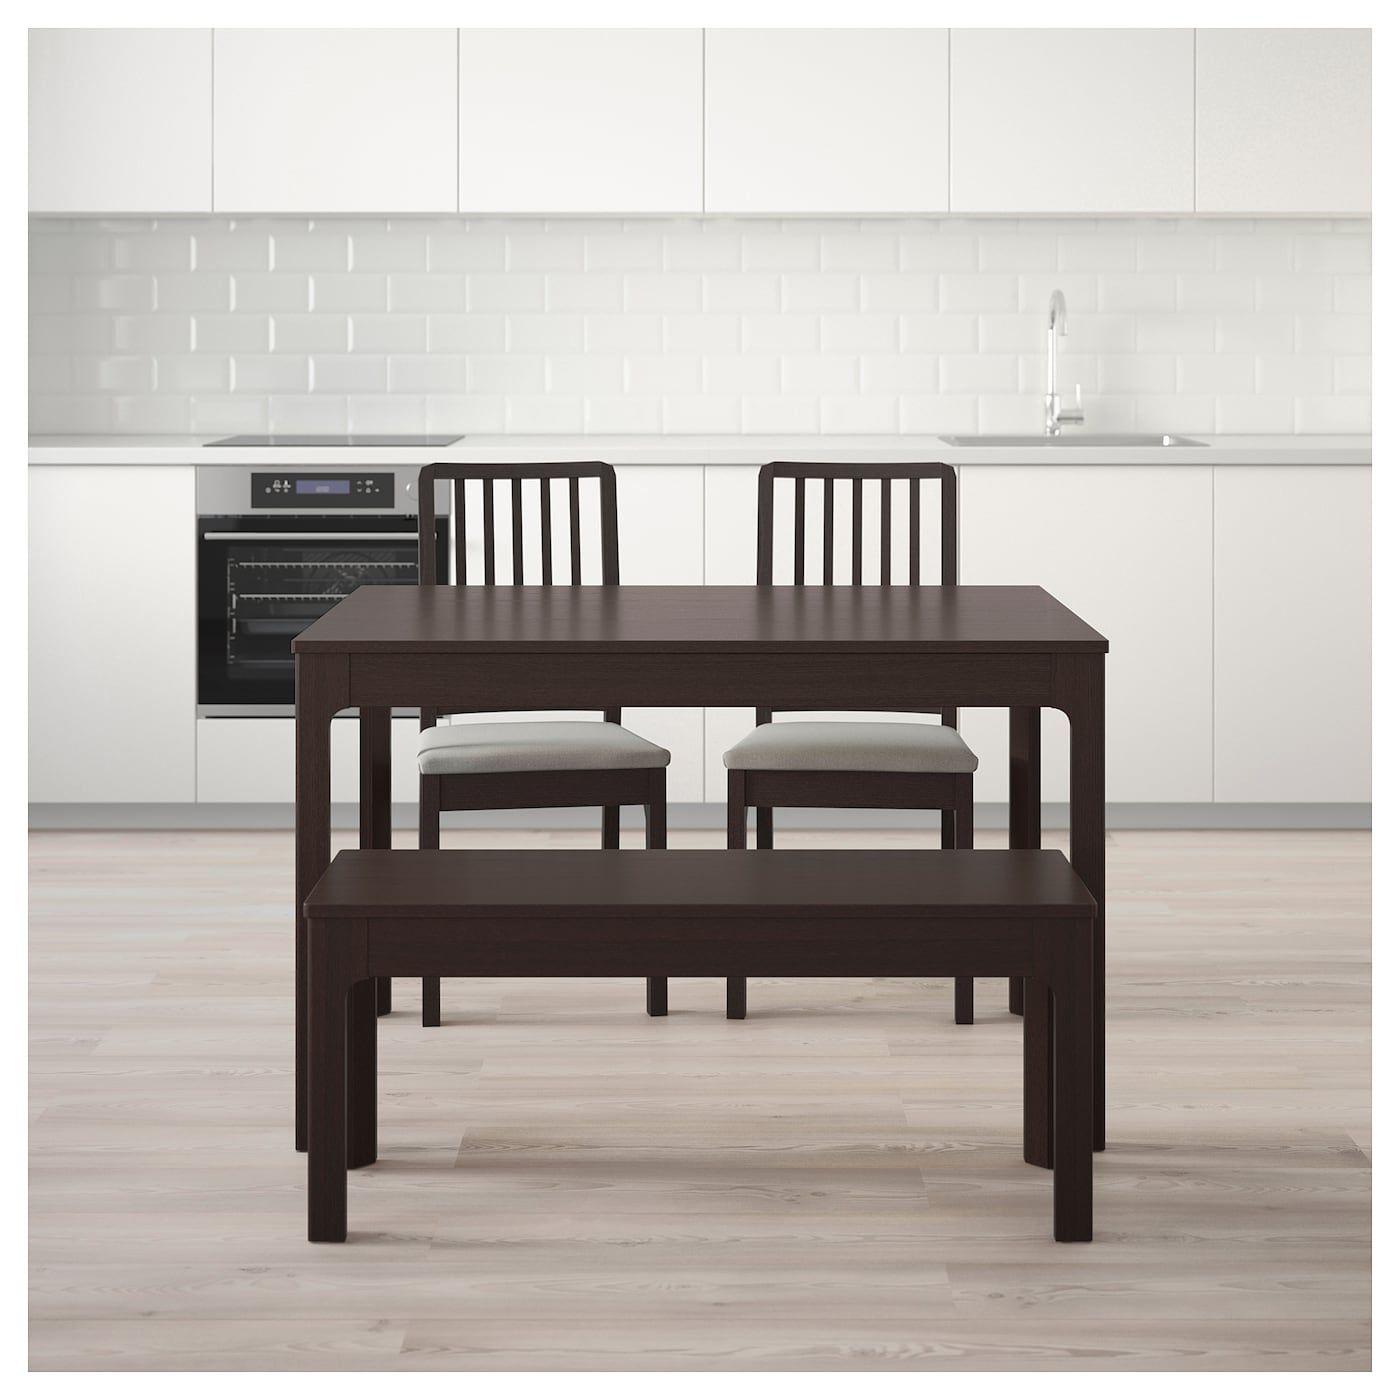 EKEDALEN / Tisch, 2 Stühle + Bank dunkelbraun, Orrsta